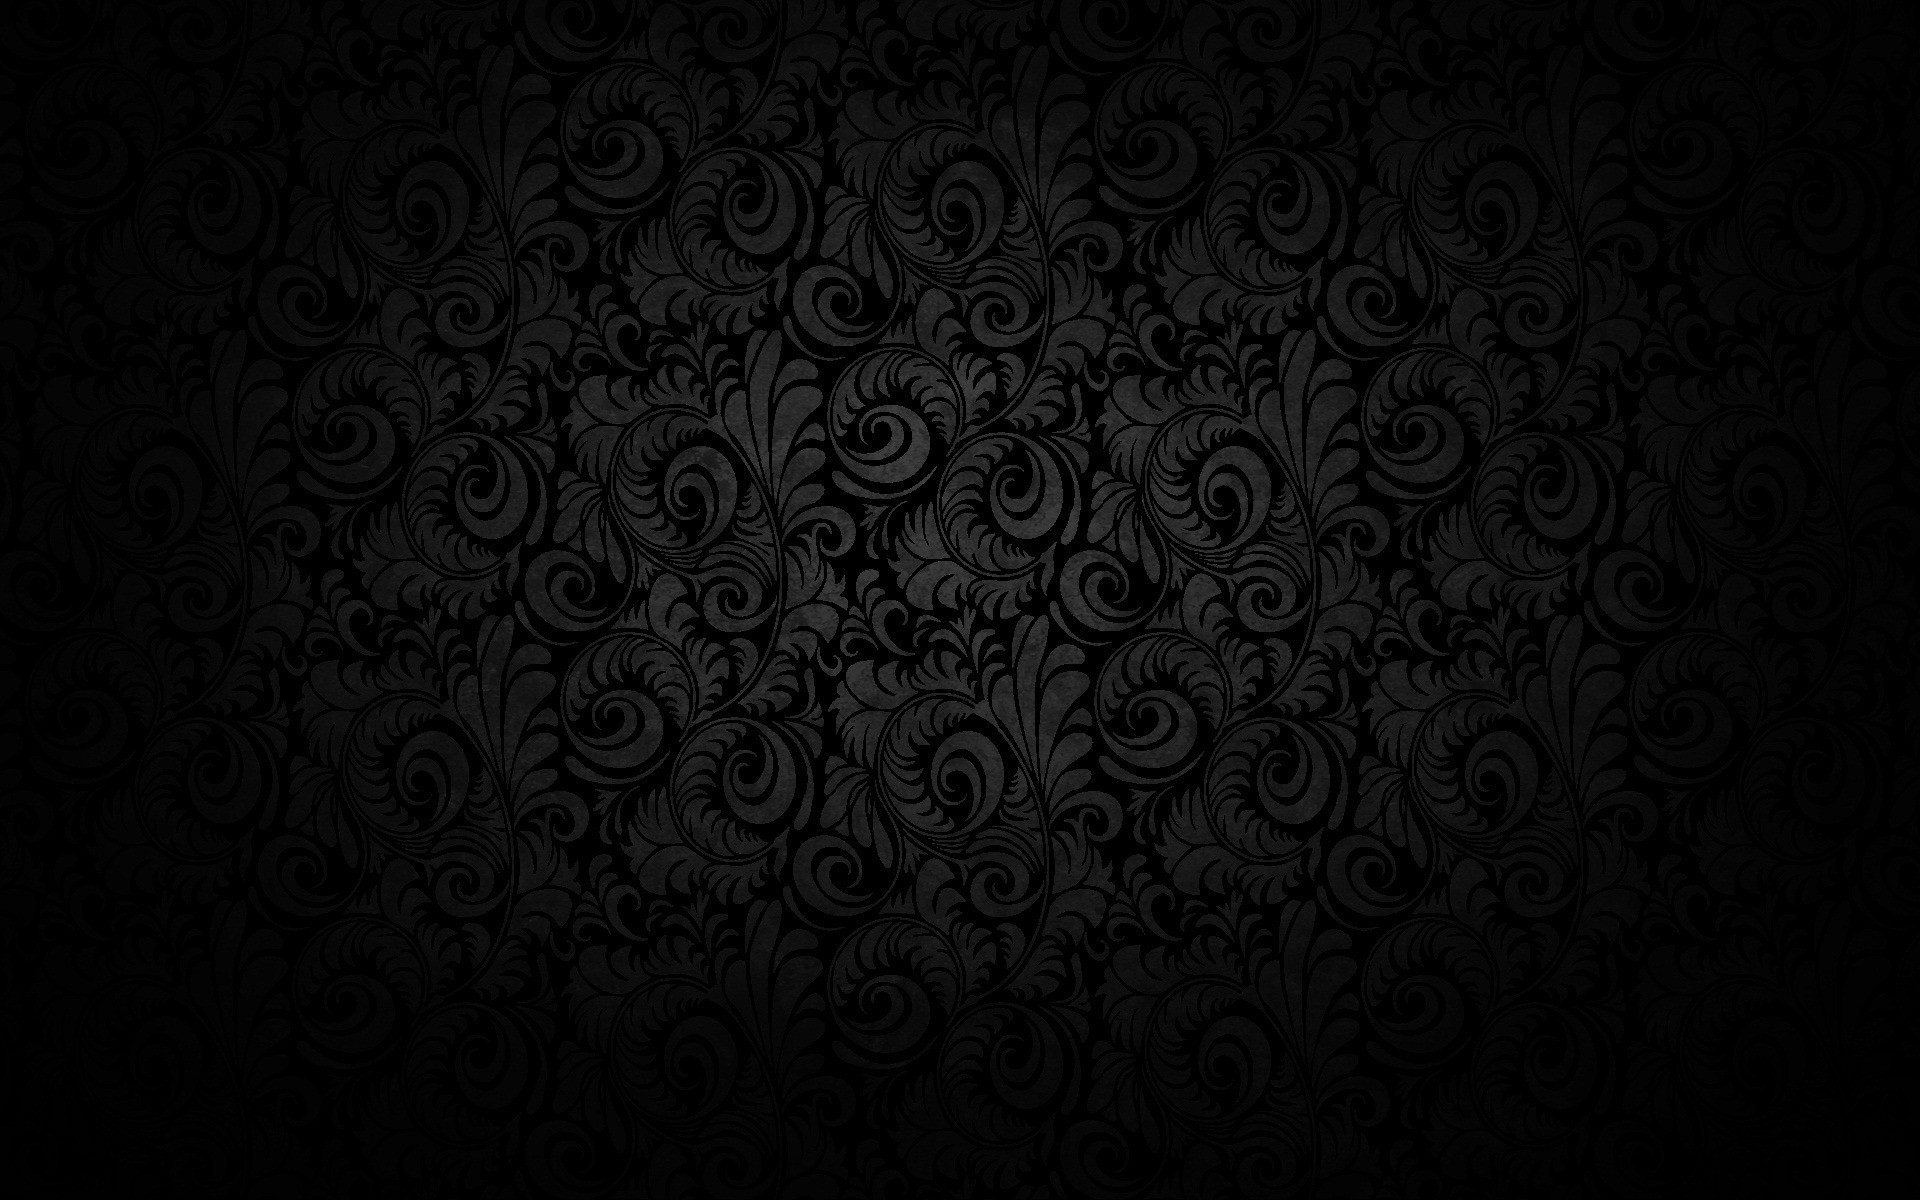 Dark Abstract Wallpaper 492